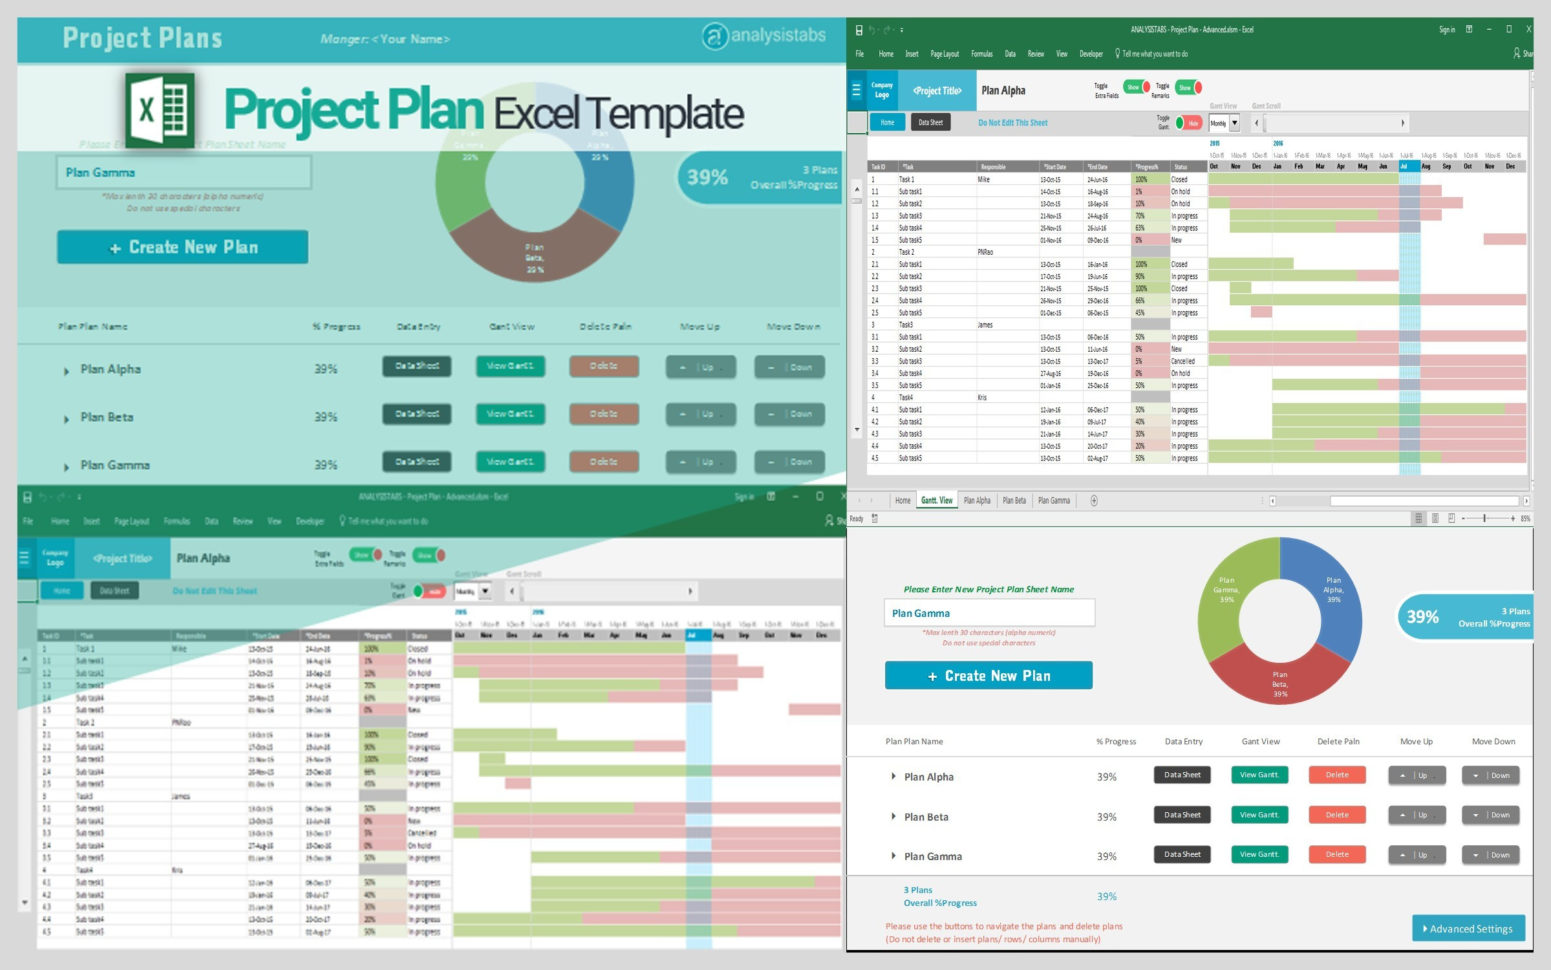 Project Plan Template Excel 2013 Elegant Luxury Timeline Template And Monthly Project Timeline Template Excel